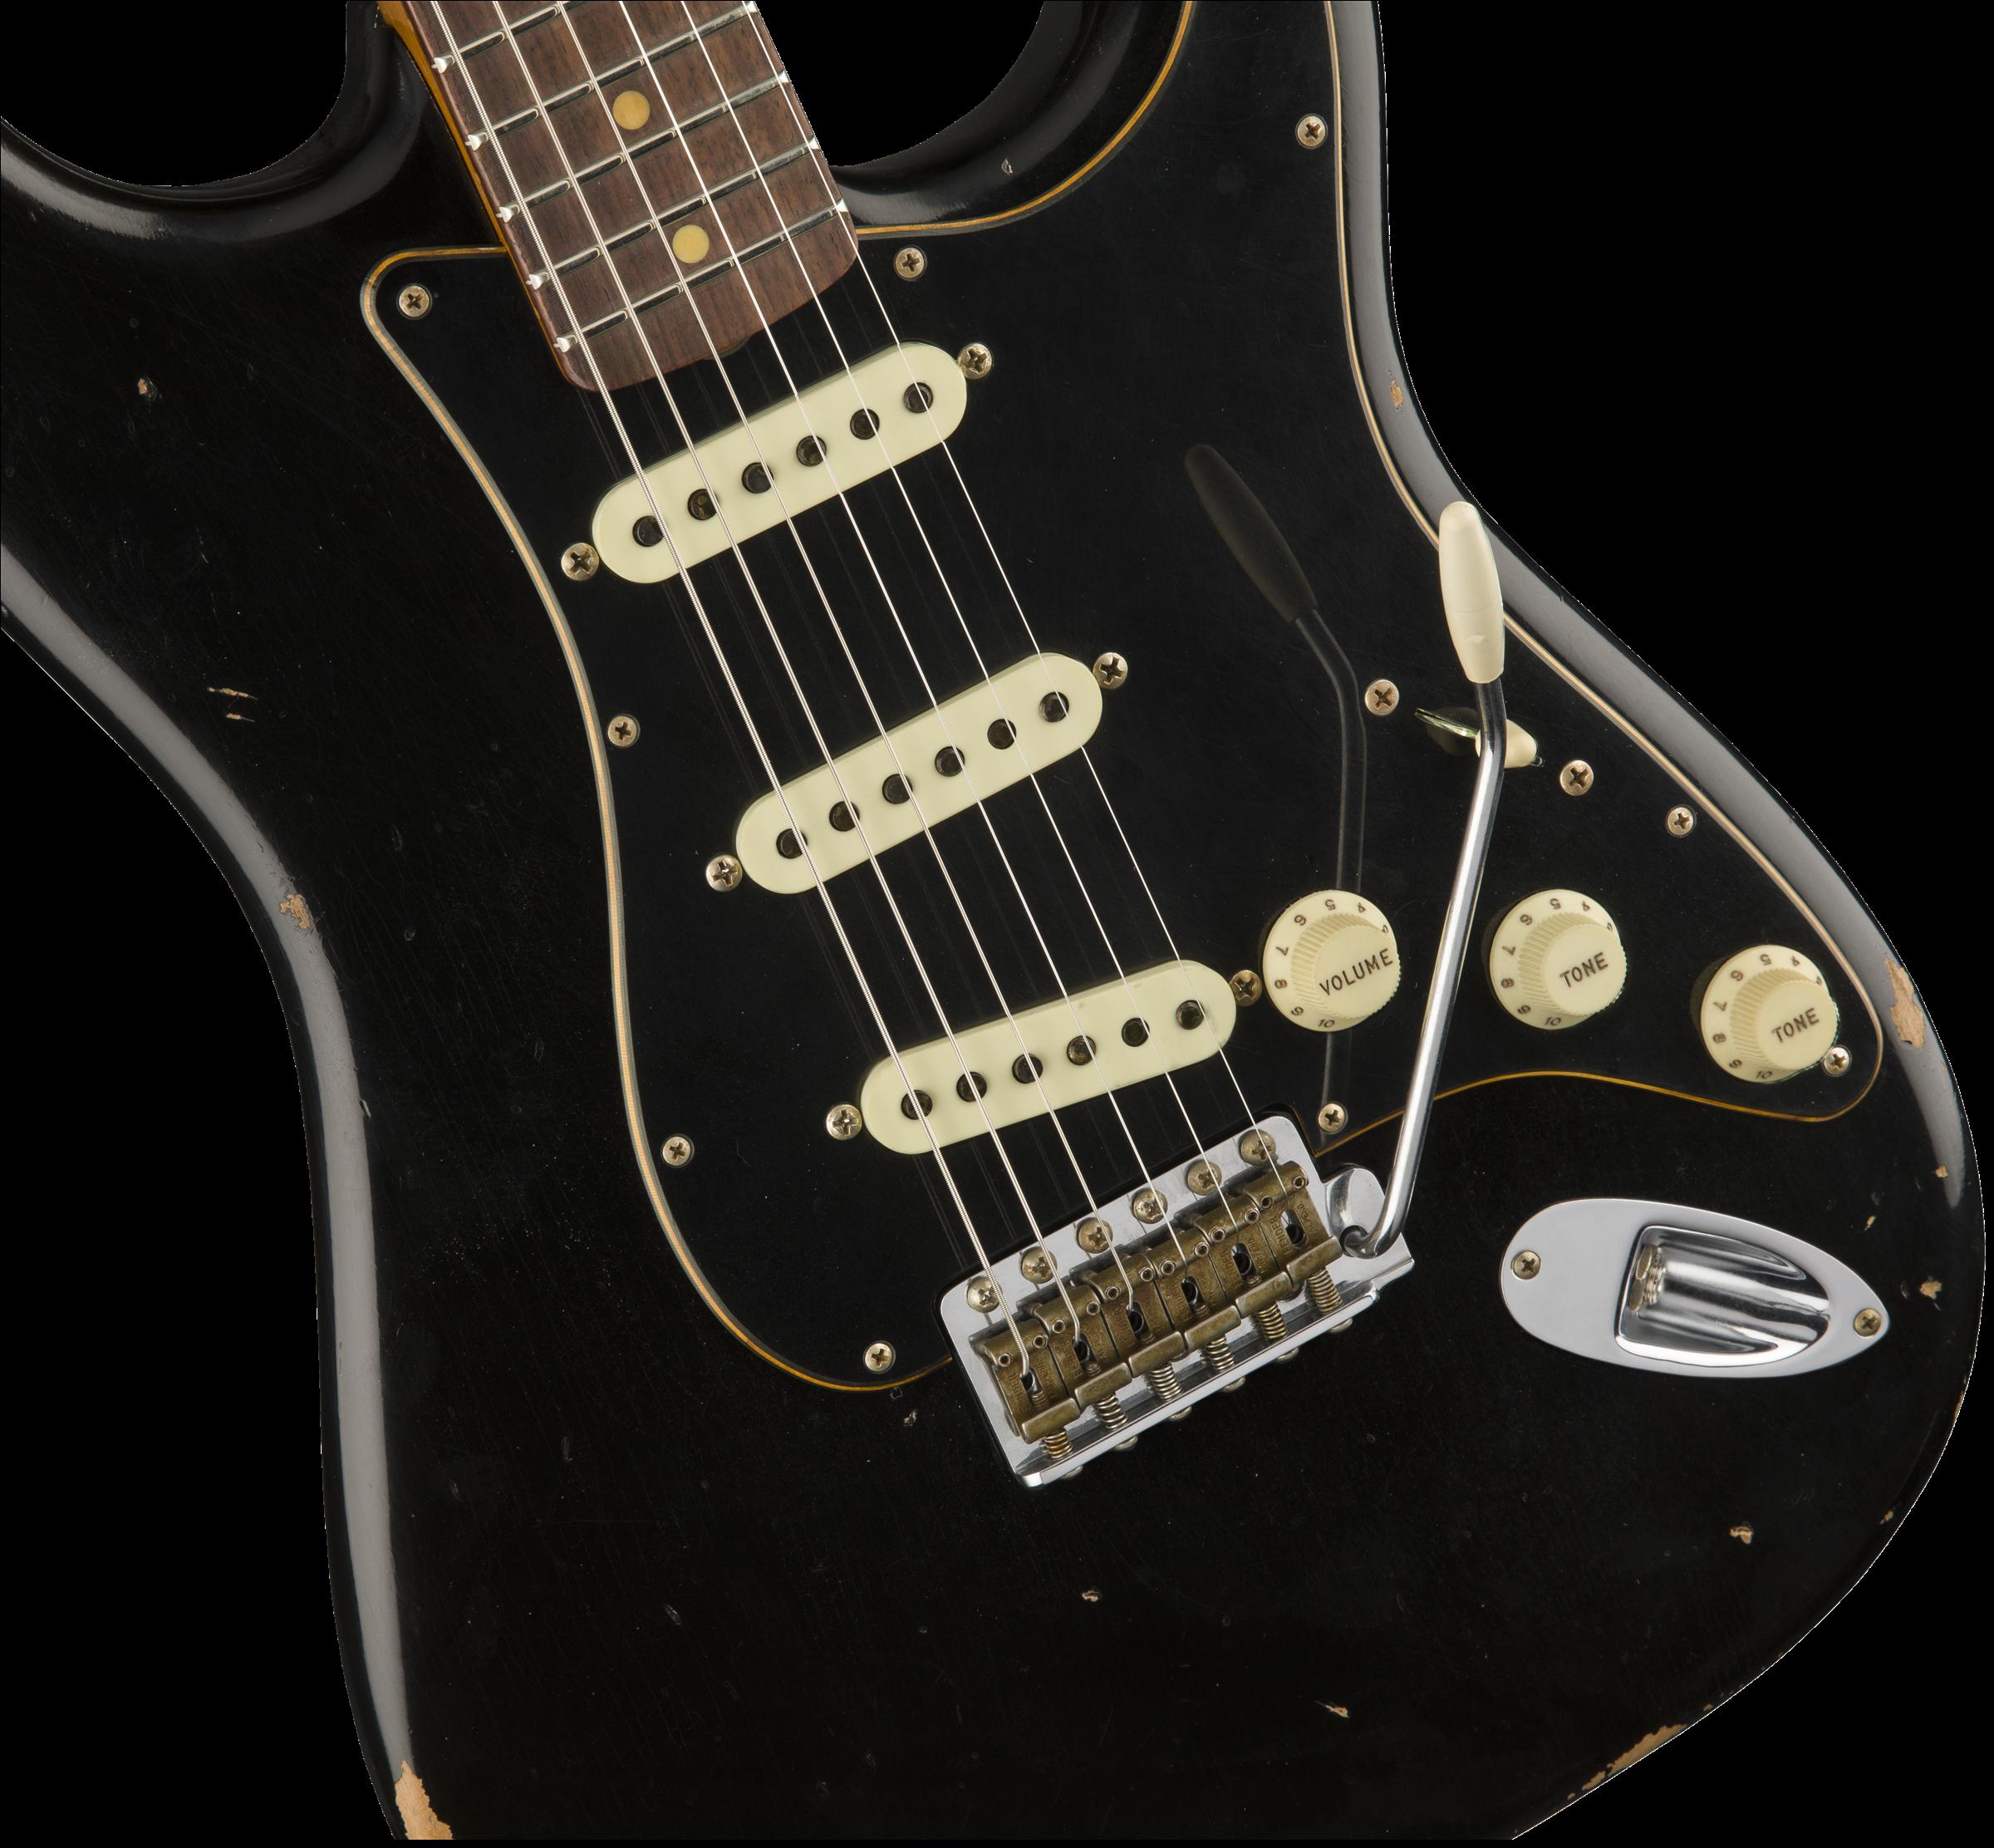 Fender Custom Shop 2017 Ltd Black Roasted Dual-Mag Strat – Relic